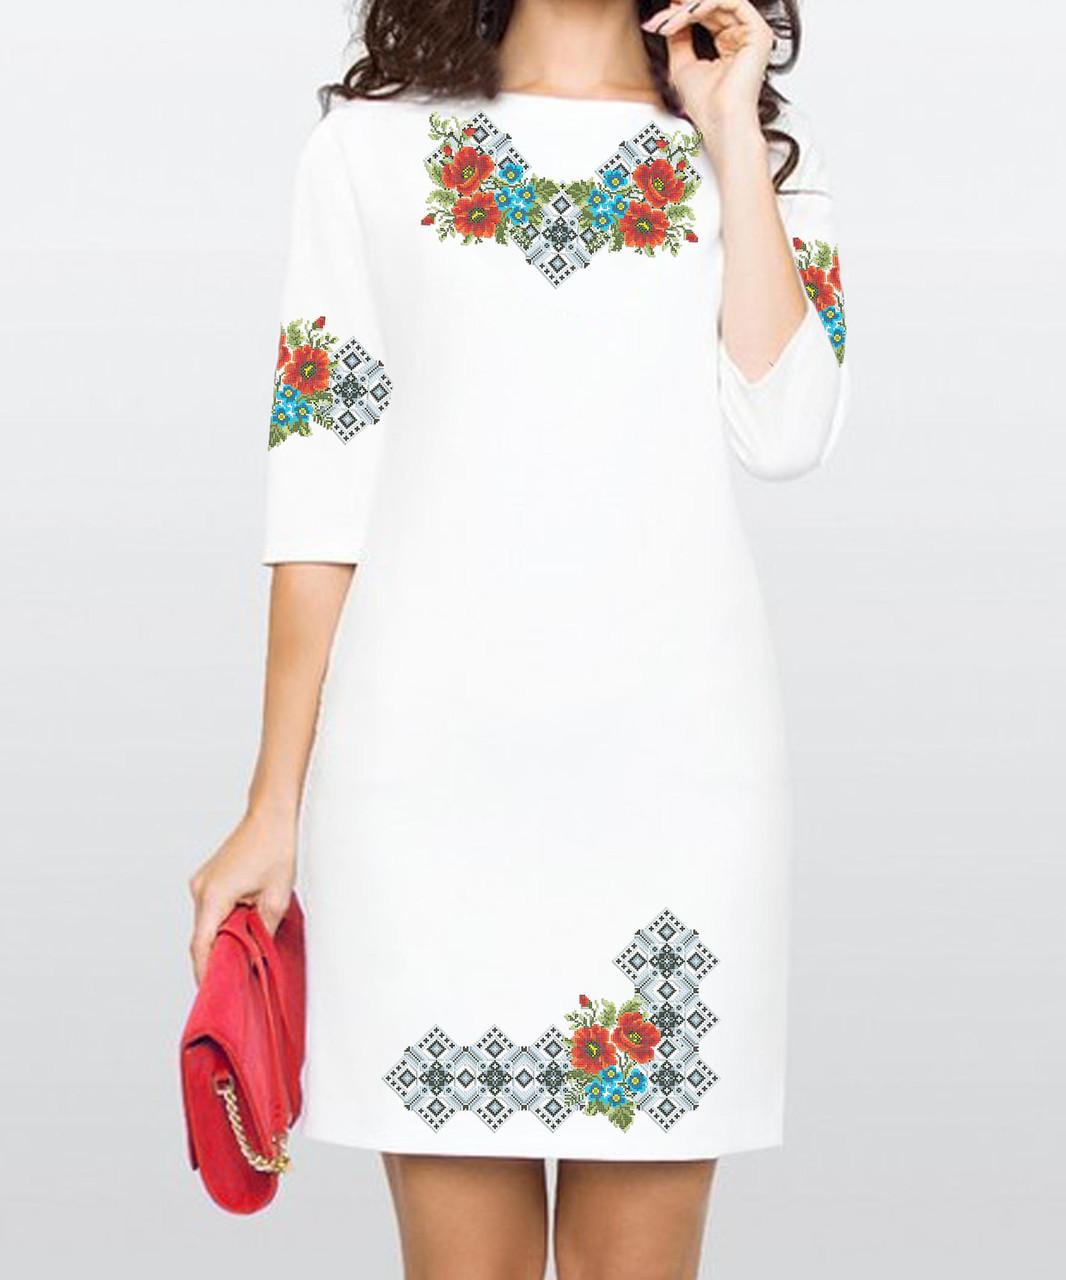 Заготовка женского платья для вышивки / вышивания бисером / ниткой «Чарівні квіти»